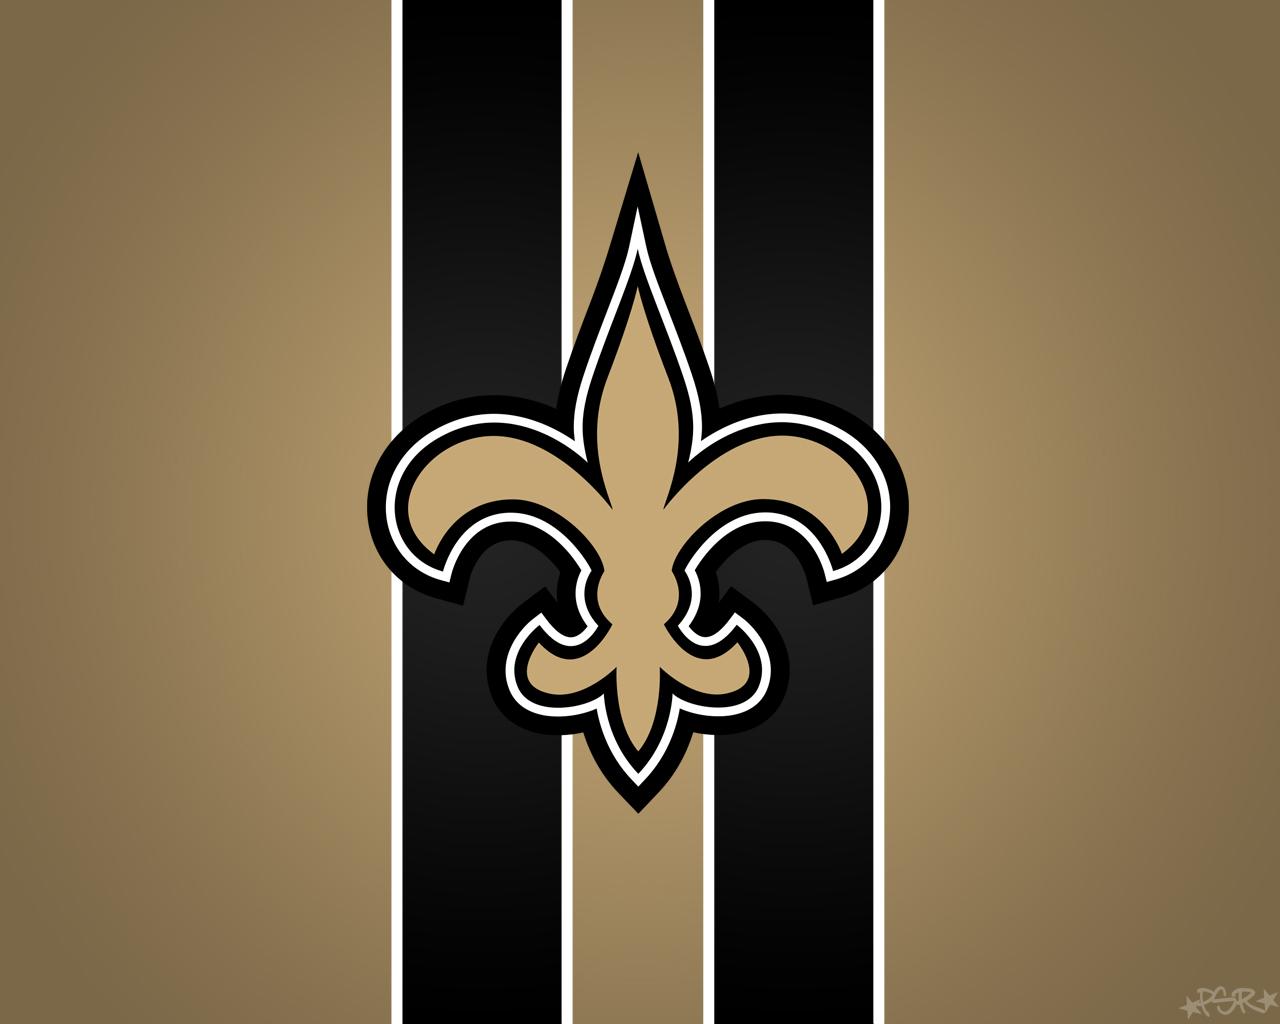 HD New Orleans Saints 1280x Wallpaper 1280x1024